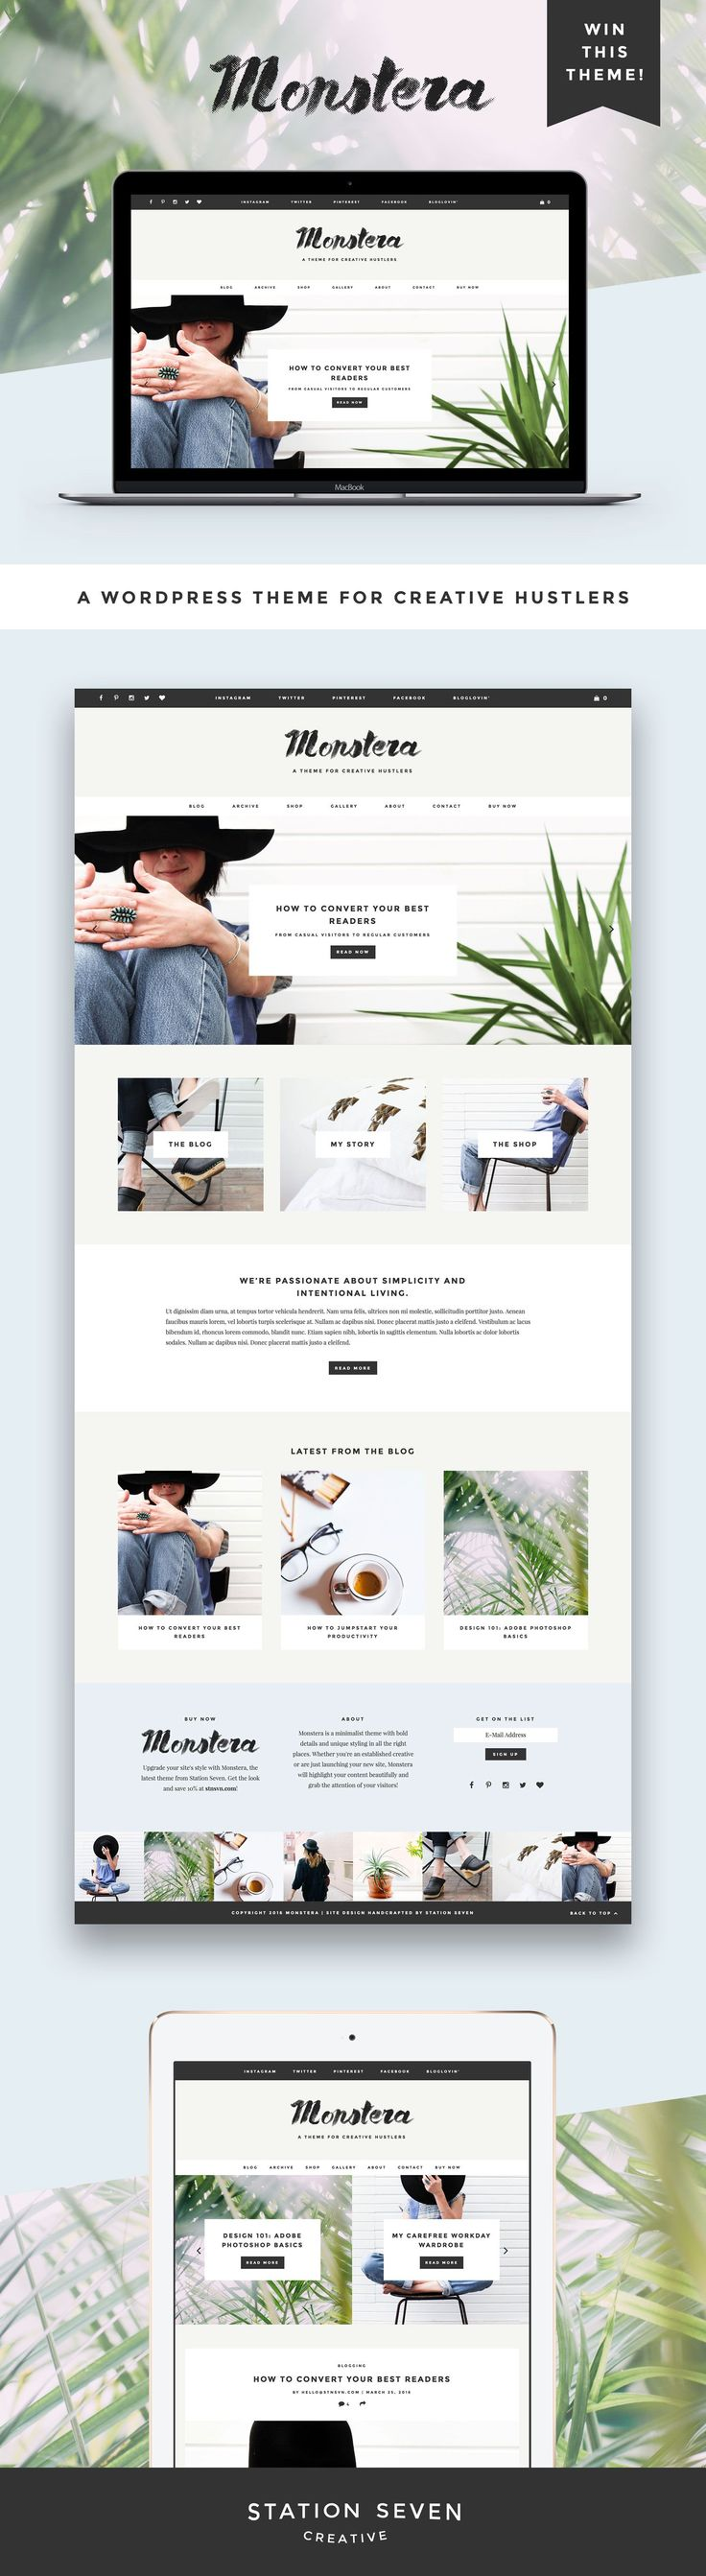 WordPress Theme   Modern, minimal web design   Blog Layout   Station Seven   Click through to buy!